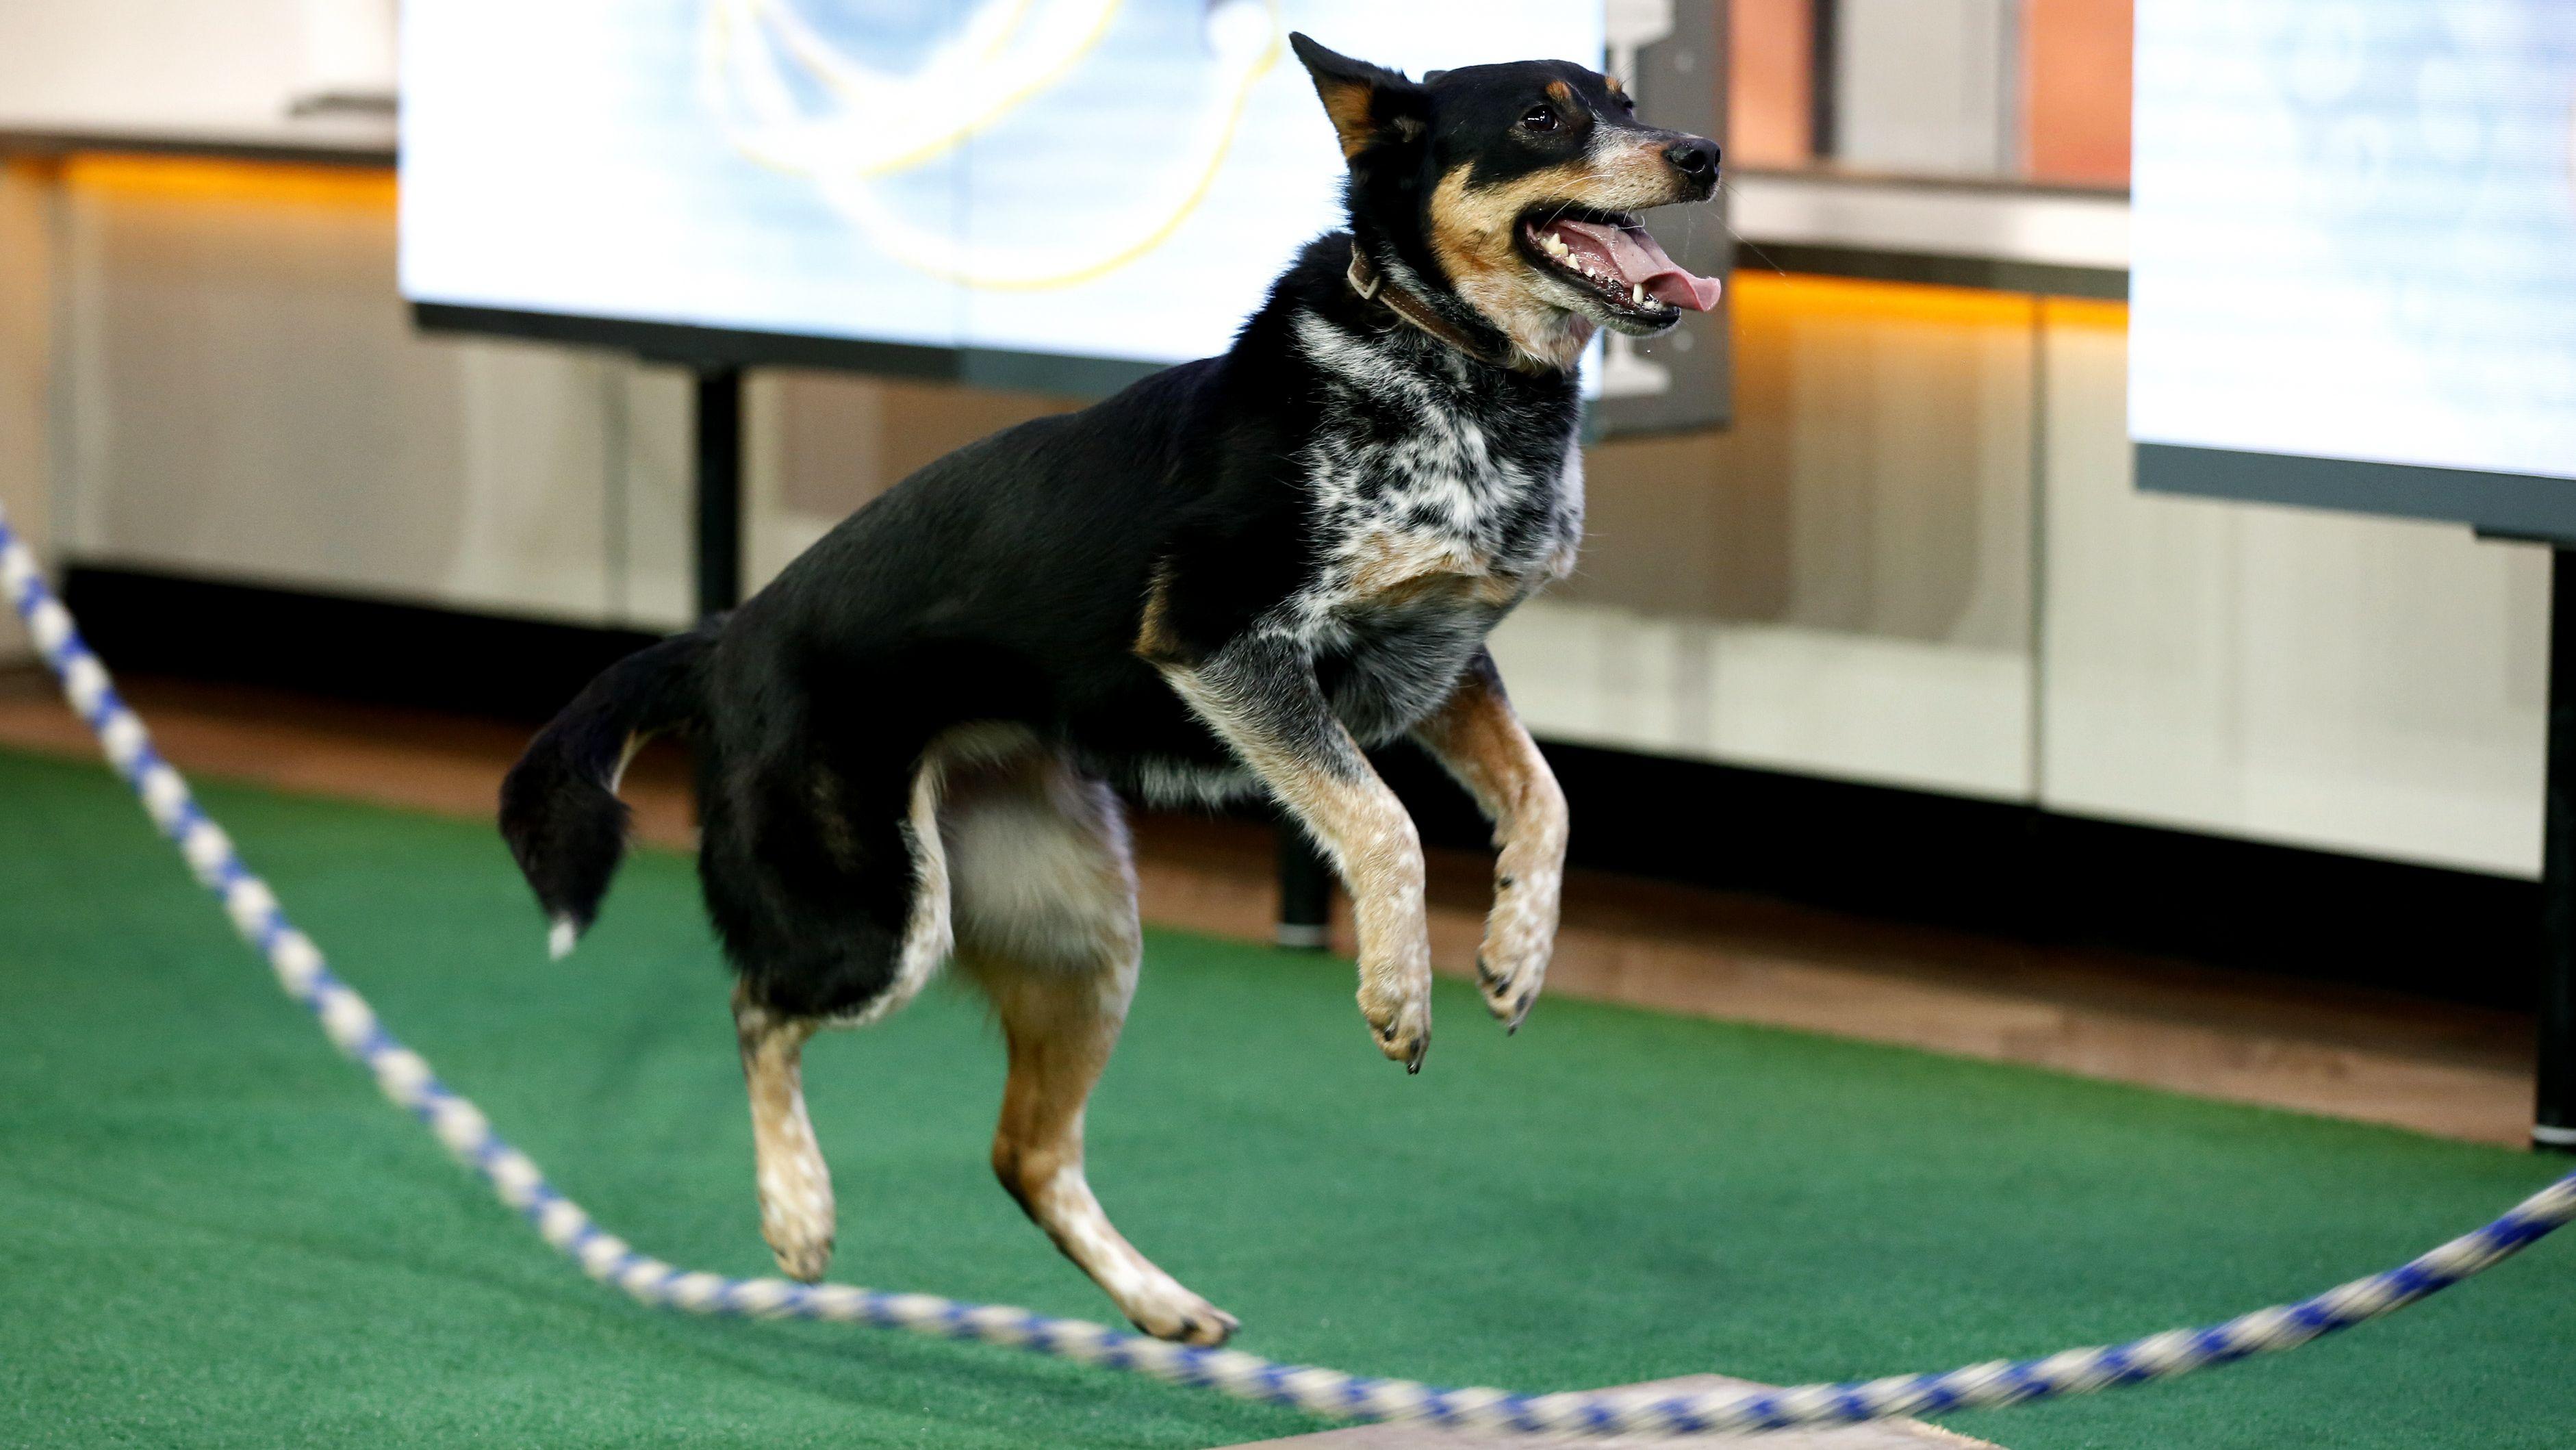 BowWOW! DoubleDutch dog breaks Guinness jump rope record